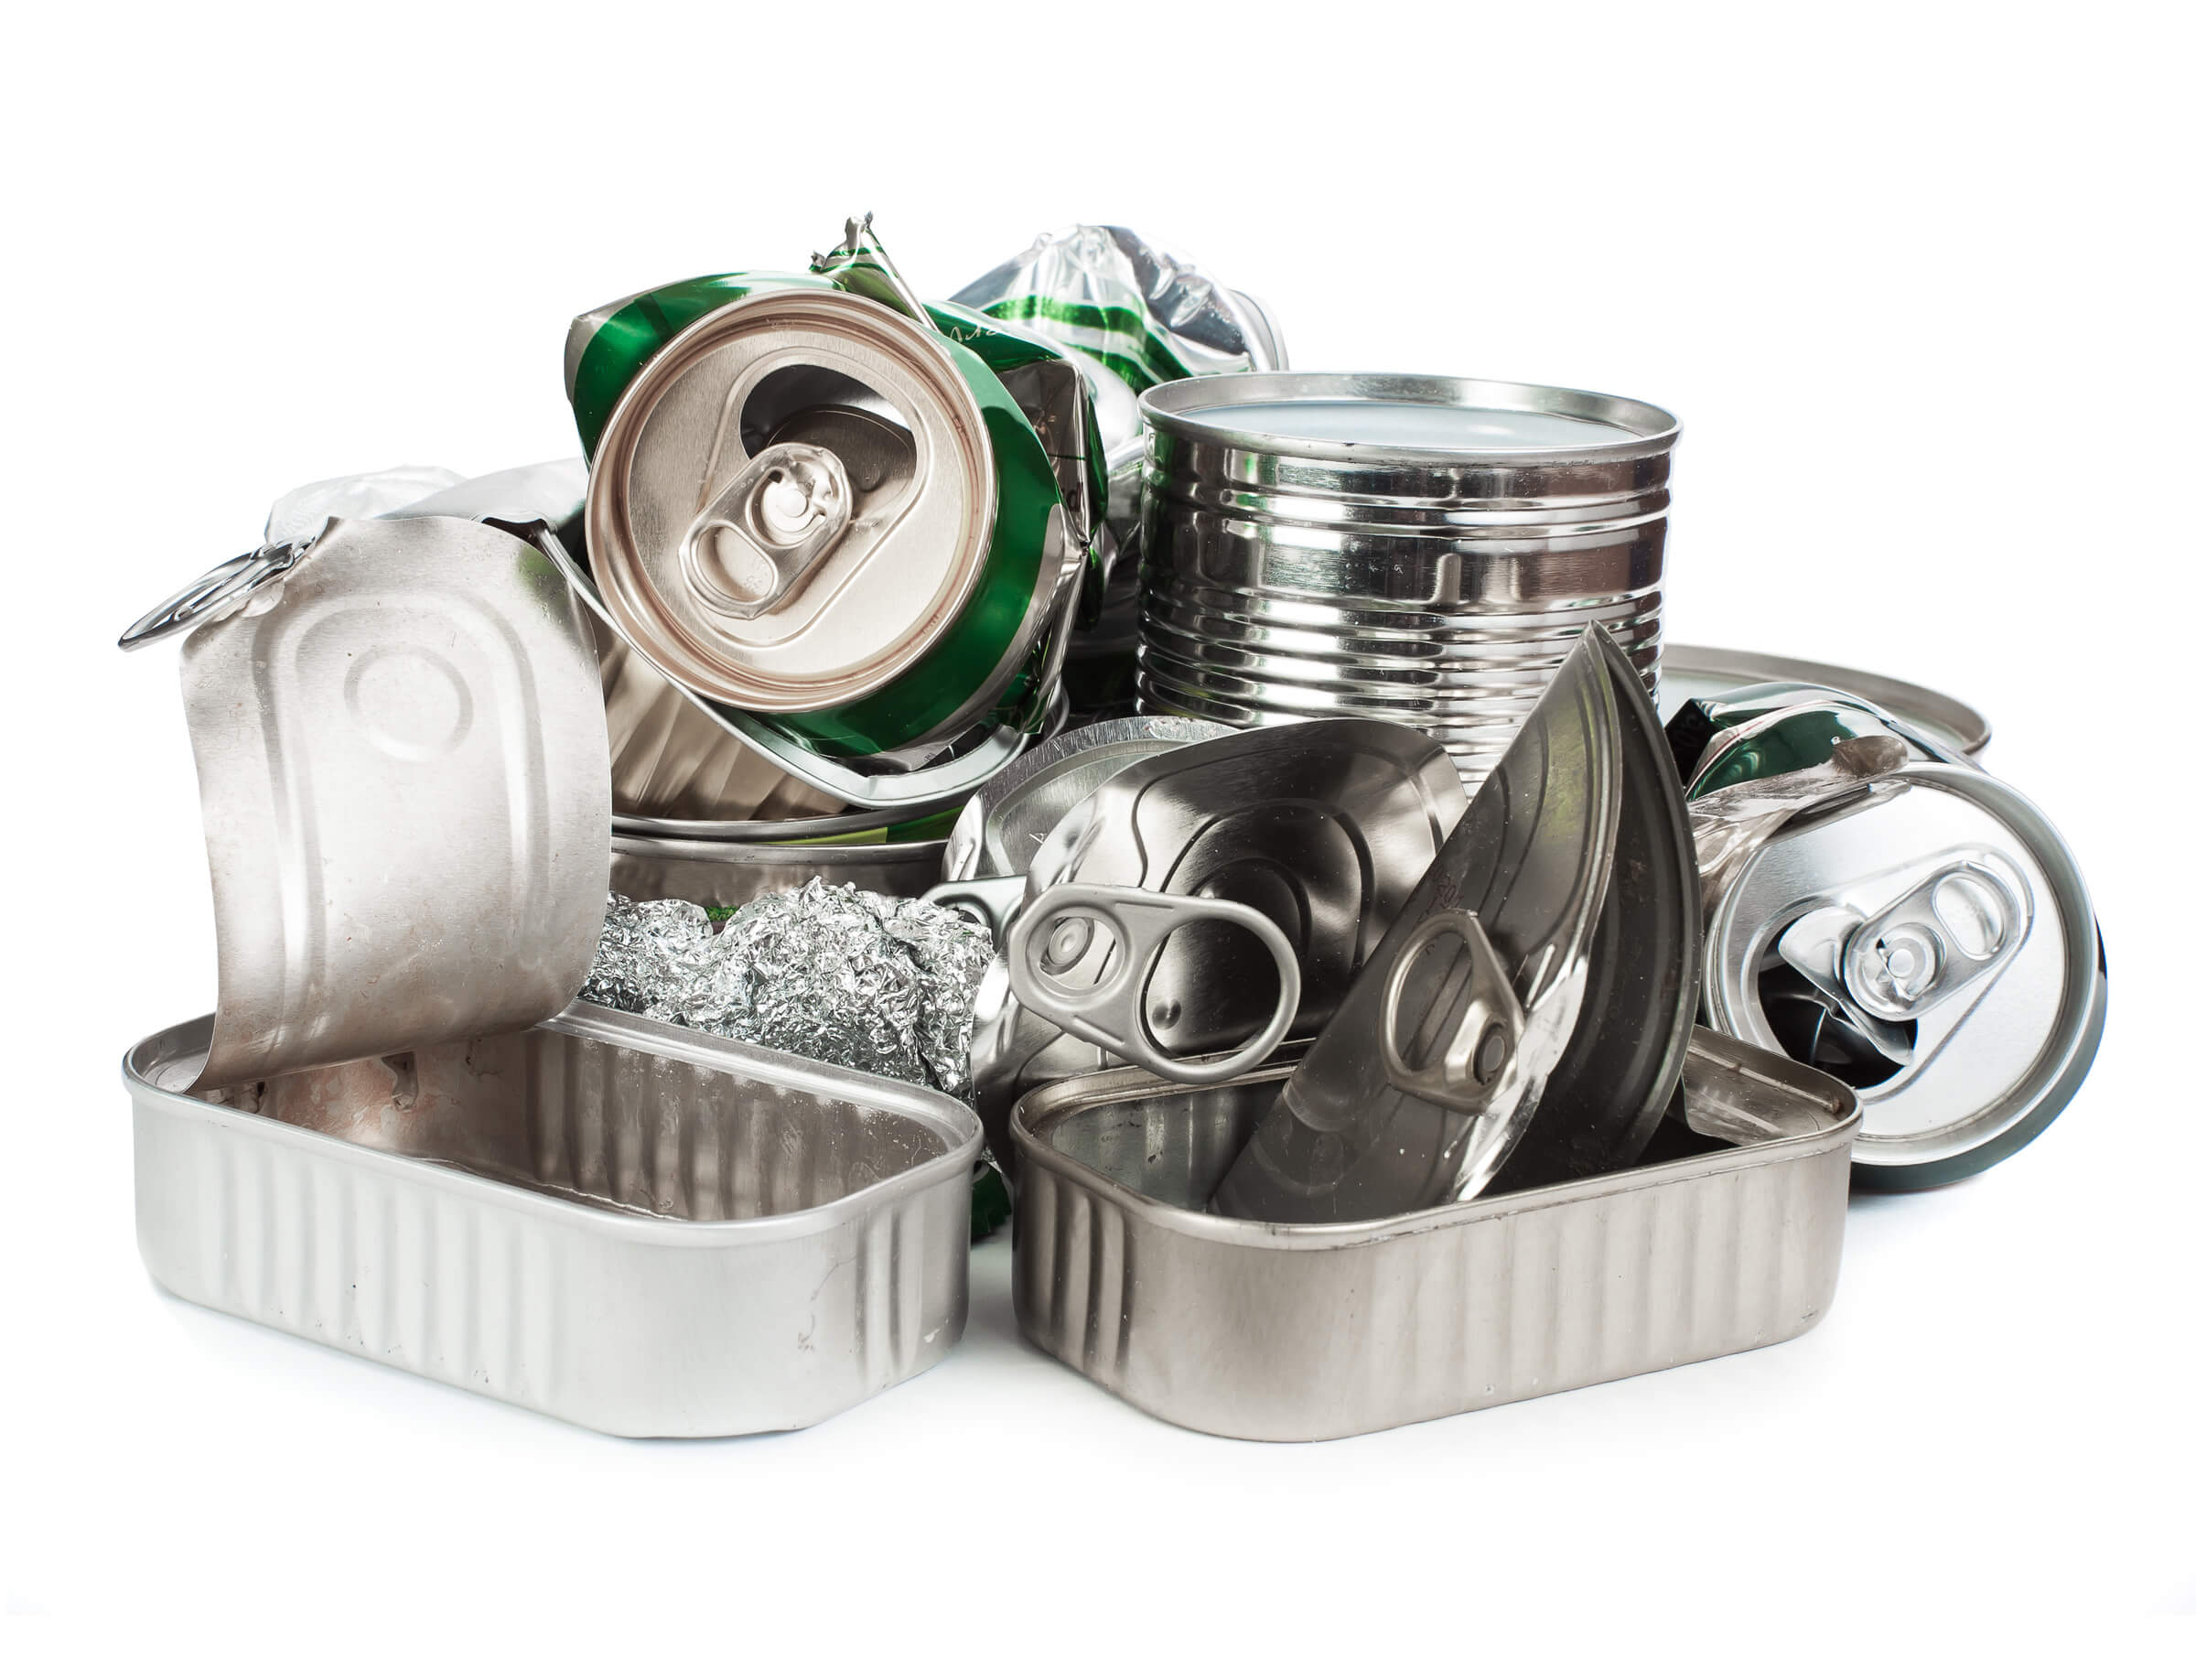 Produktionsabfall Konservendosen und Aludosen